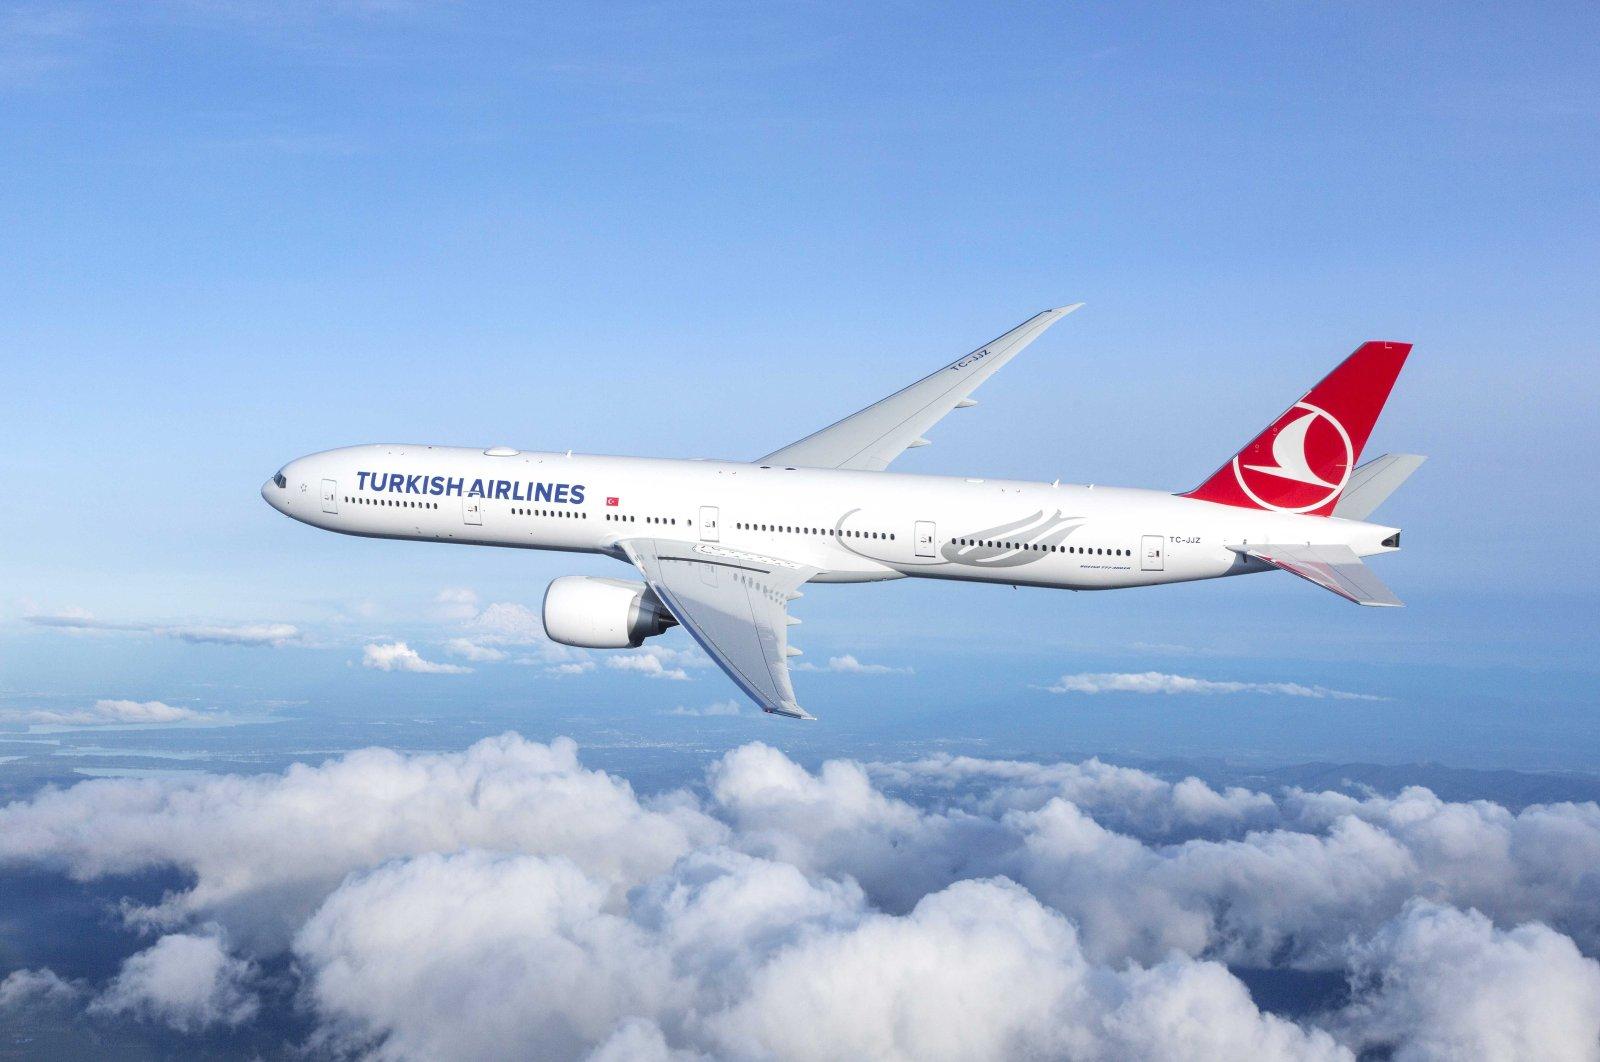 Turkish Airlines (THY) has gradually resumed international flights beginning in June after a COVID-19 hiatus. (Photo by THY via AA)